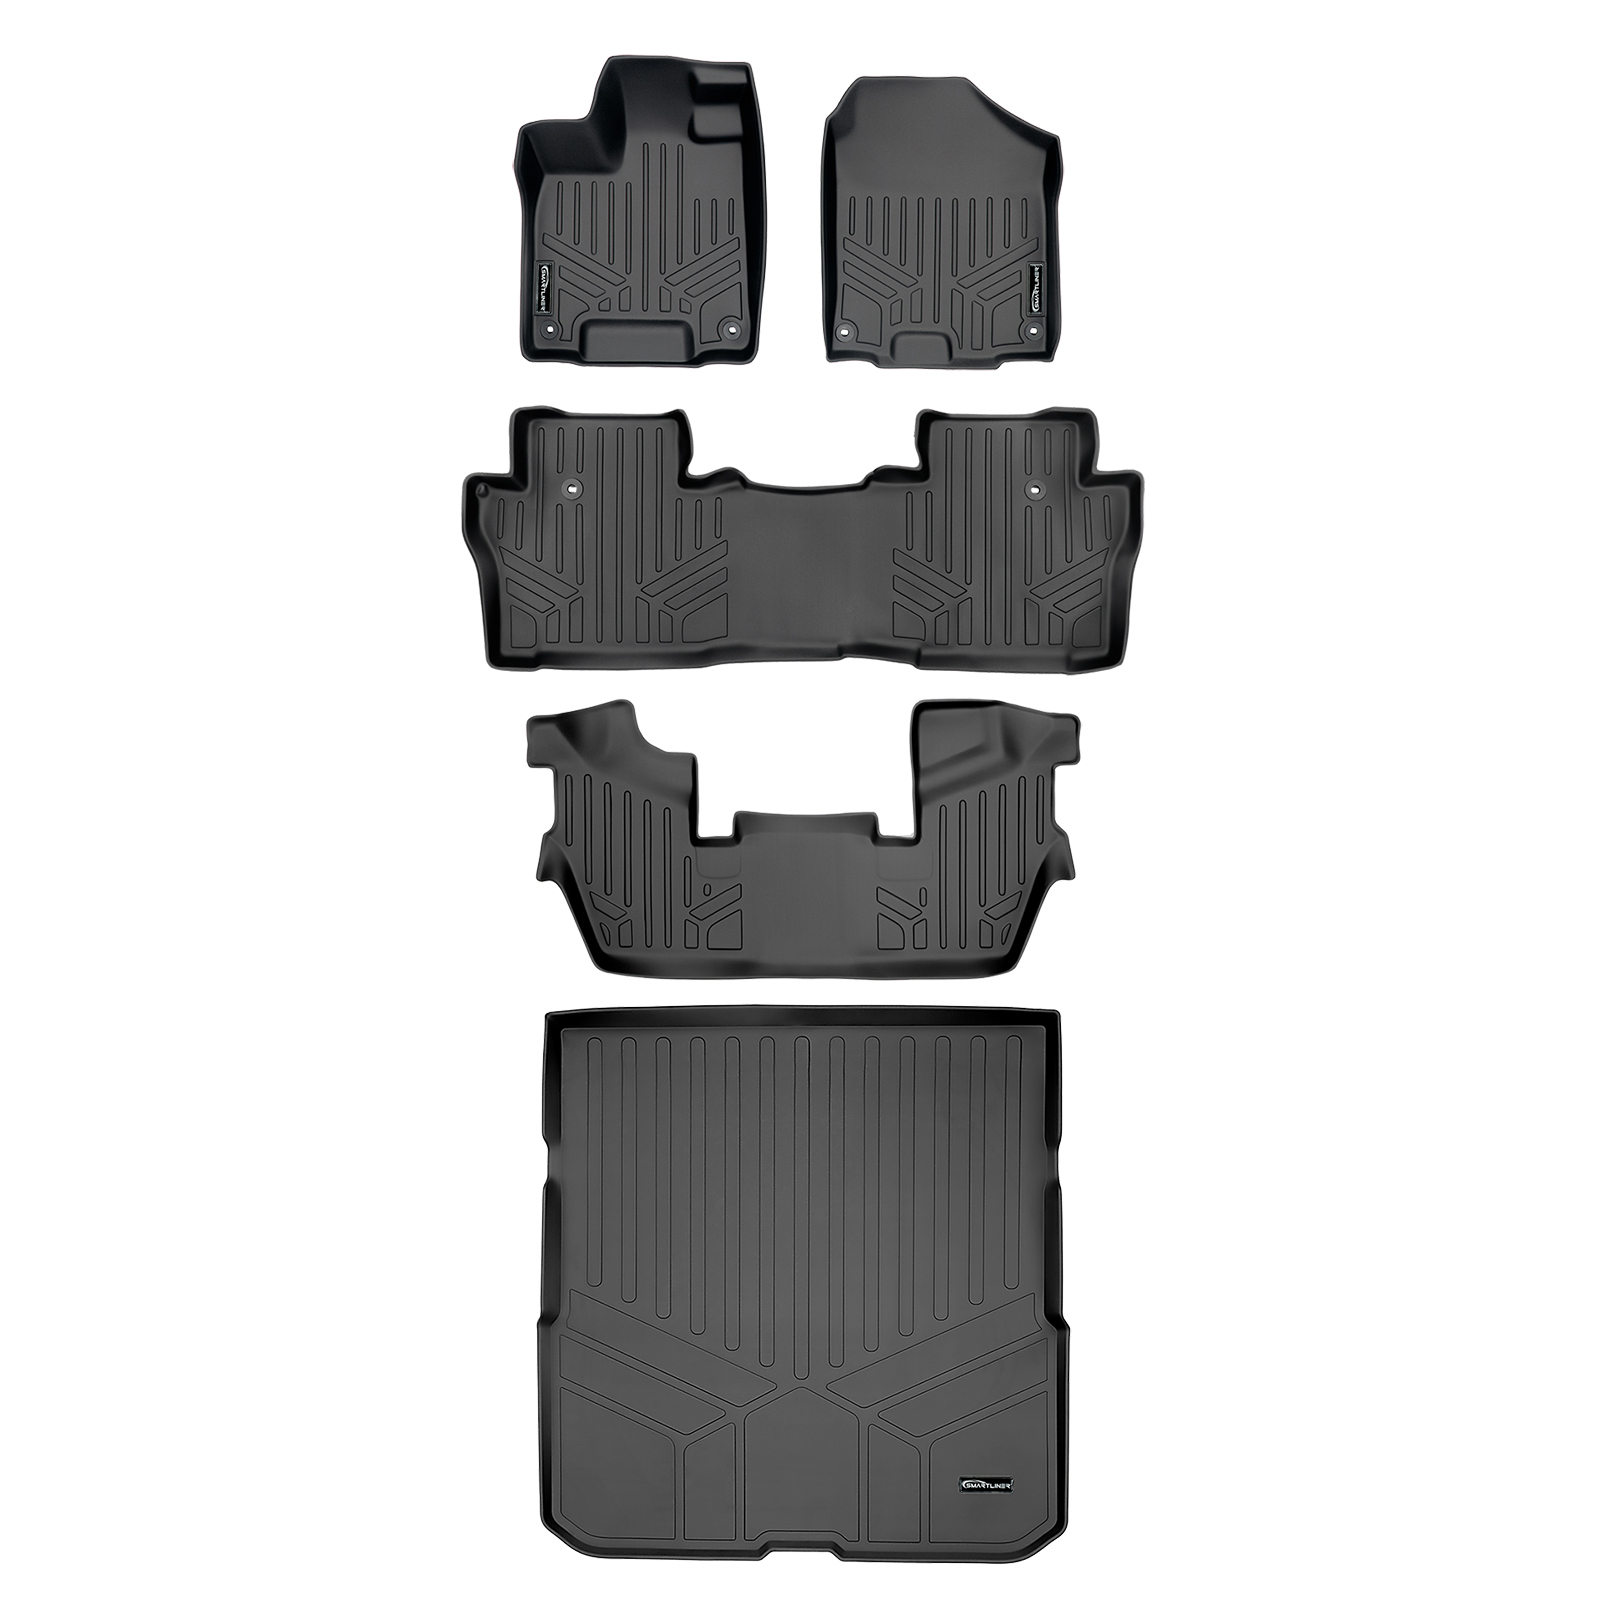 SMARTLINER Custom Fit Floor Mats 2 Row Liner Set Black for 2016-2019 Honda Pilot